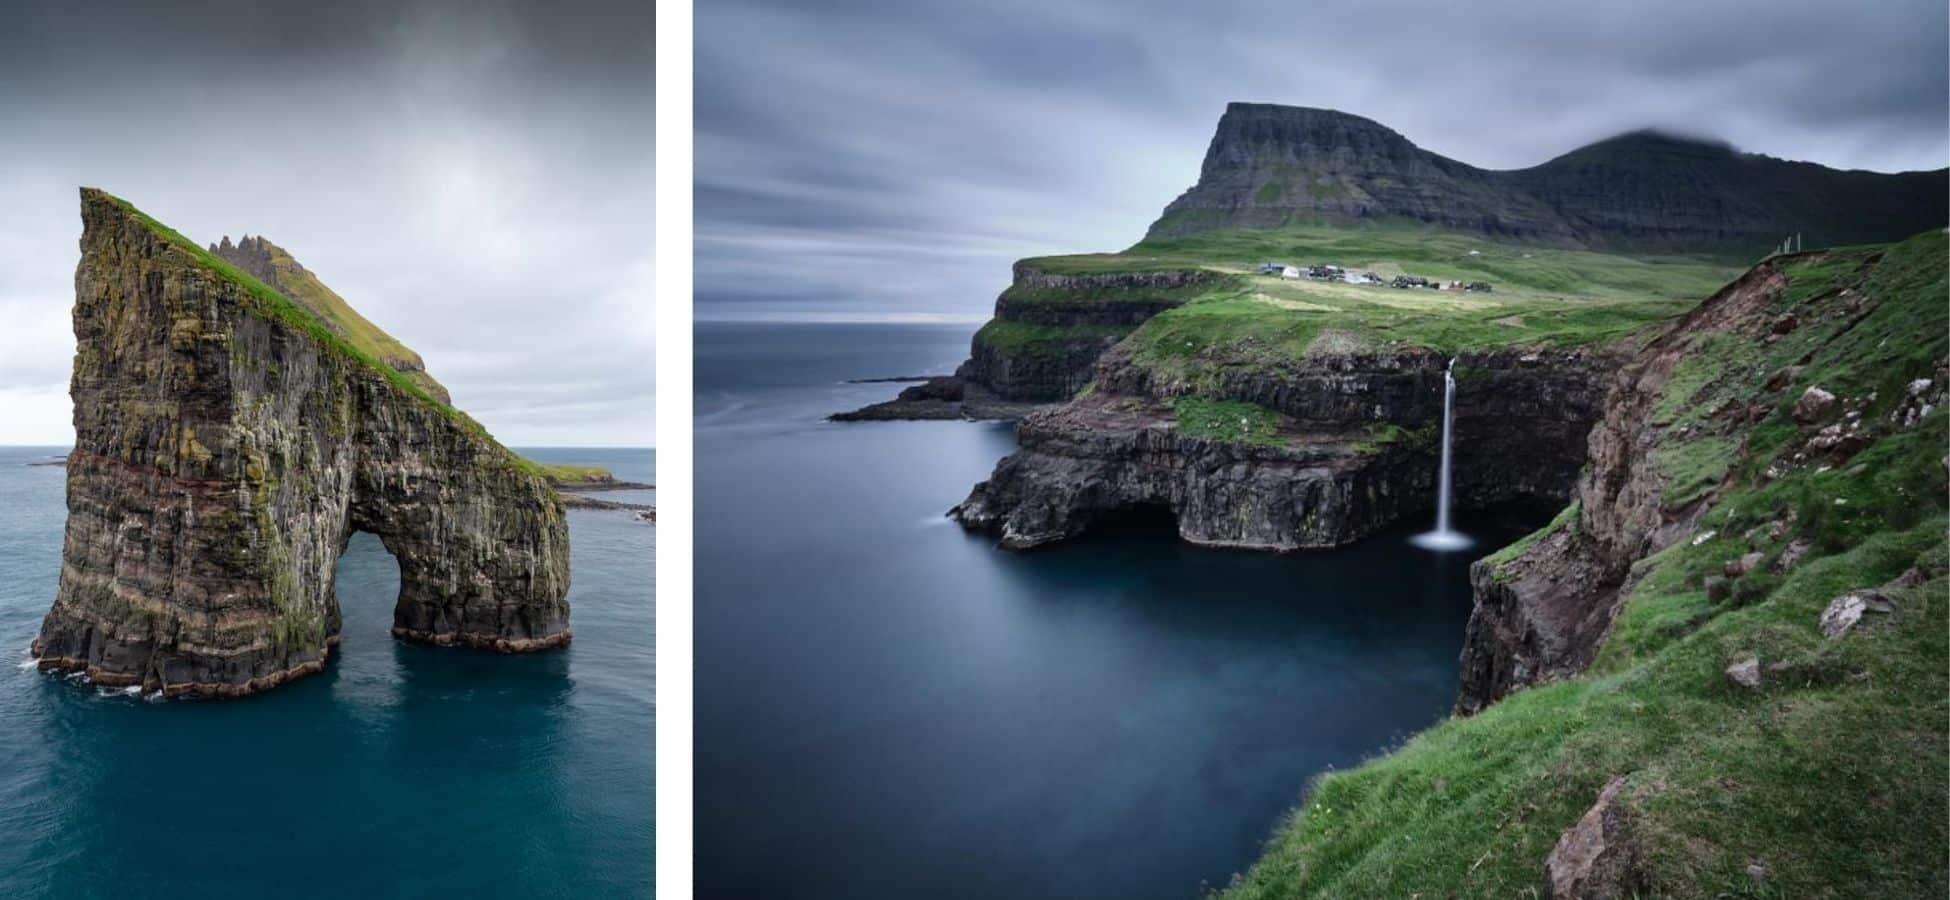 Iles-Féroé - Islande, Vikings